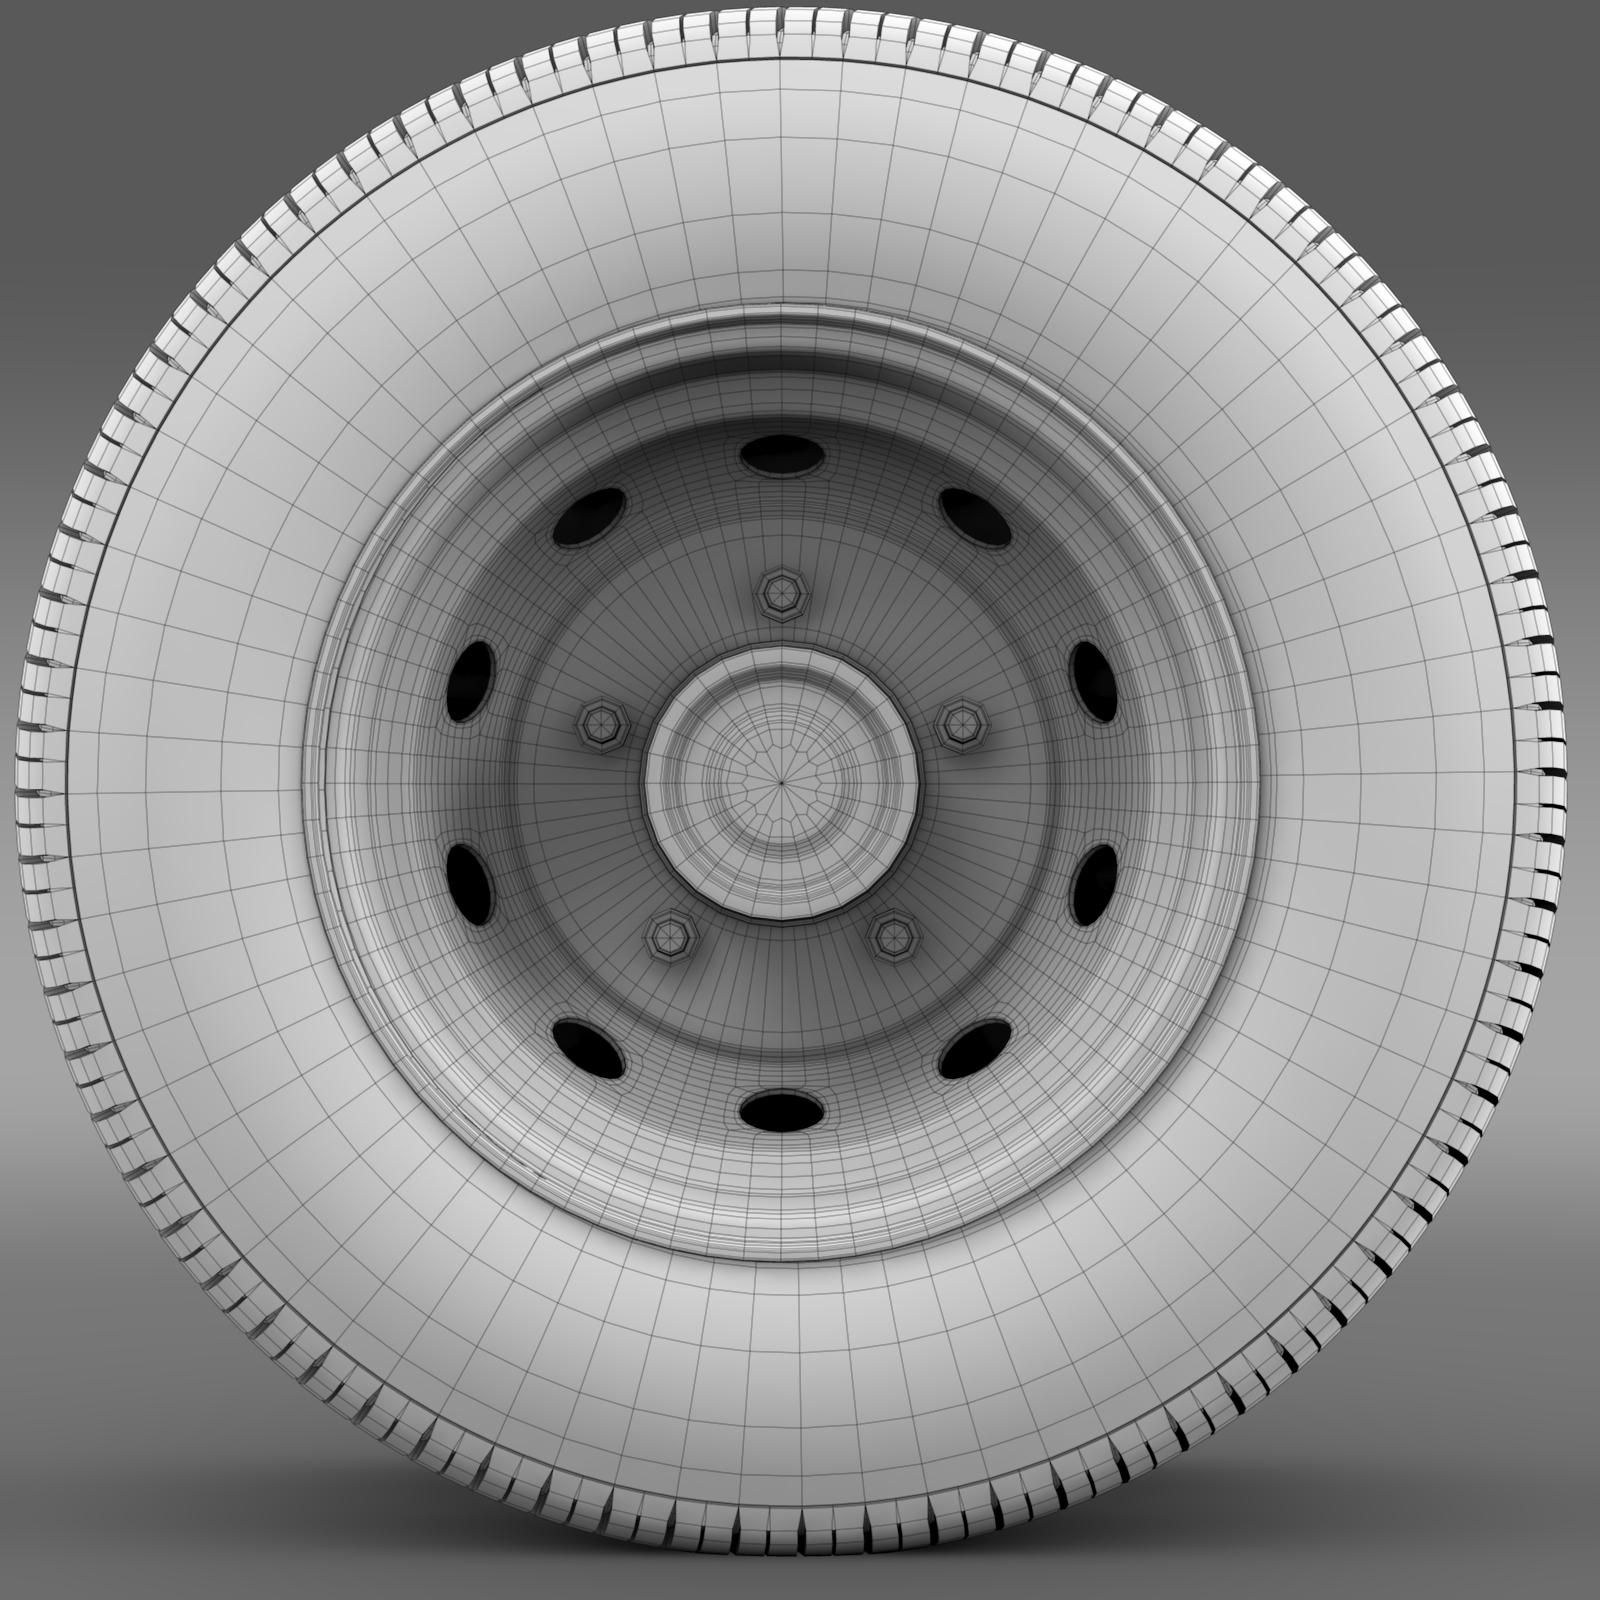 ashok leyland wheel2 3d model 3ds max fbx c4d lwo ma mb hrc xsi obj 212722